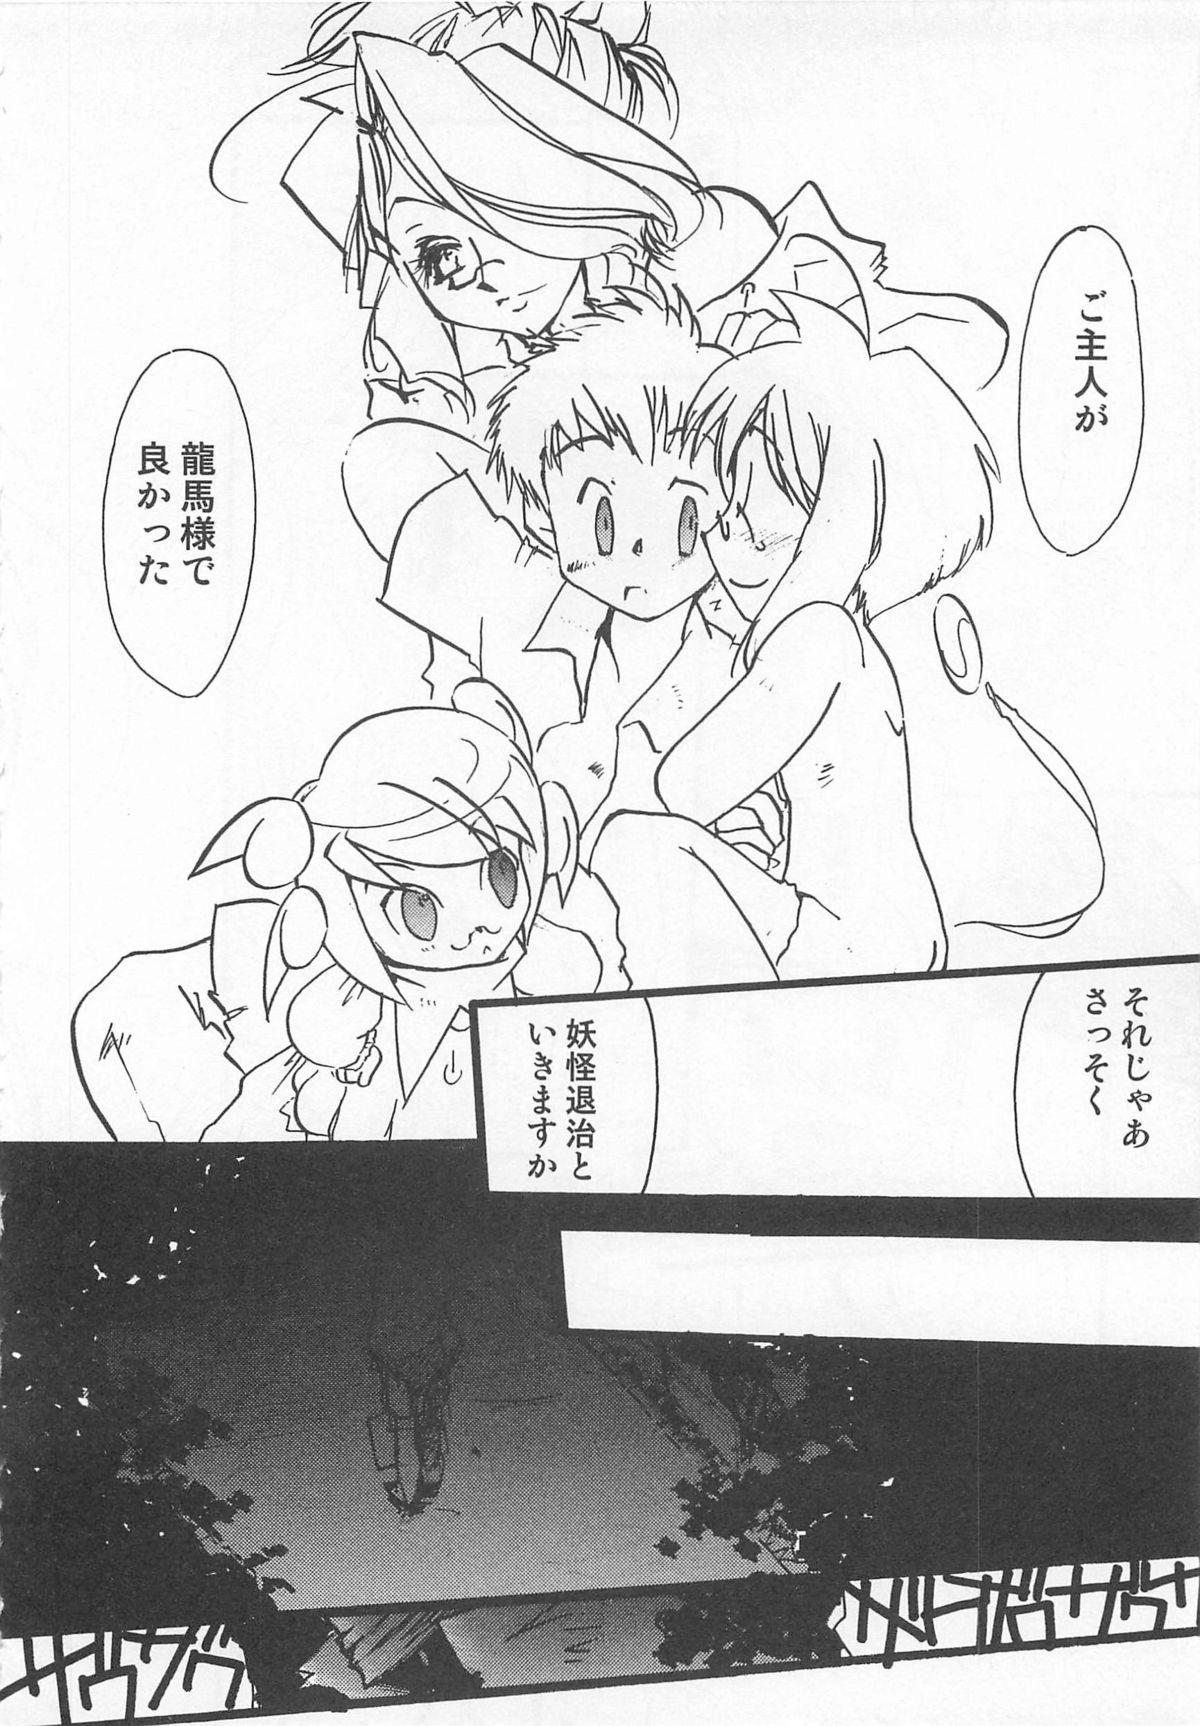 Otokonoko HEAVEN Vol. 02 Dokidoki Chikan Taiken 18